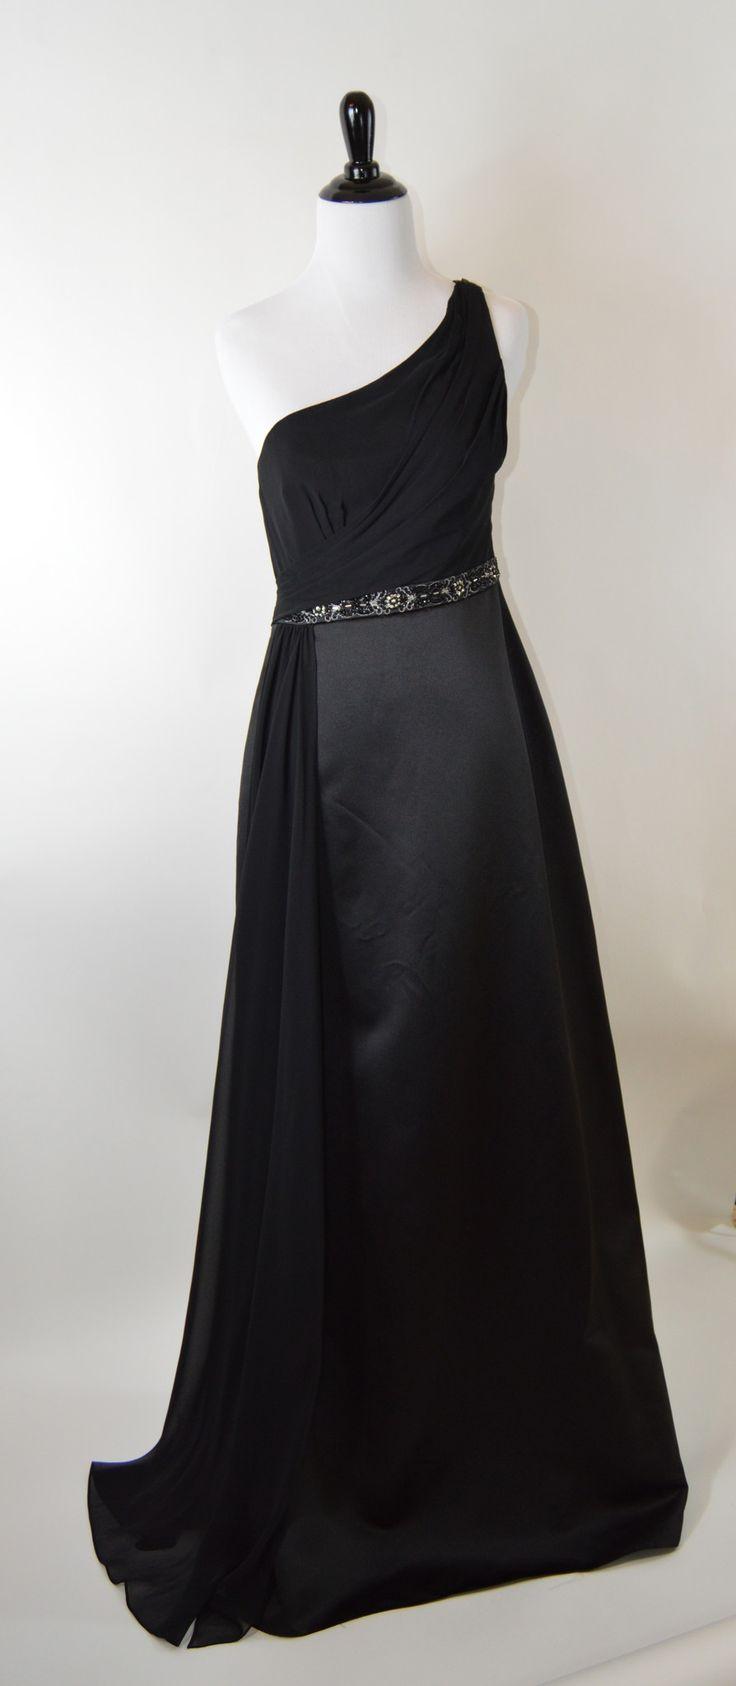 best caroleeus place formal dresses gently worn images on